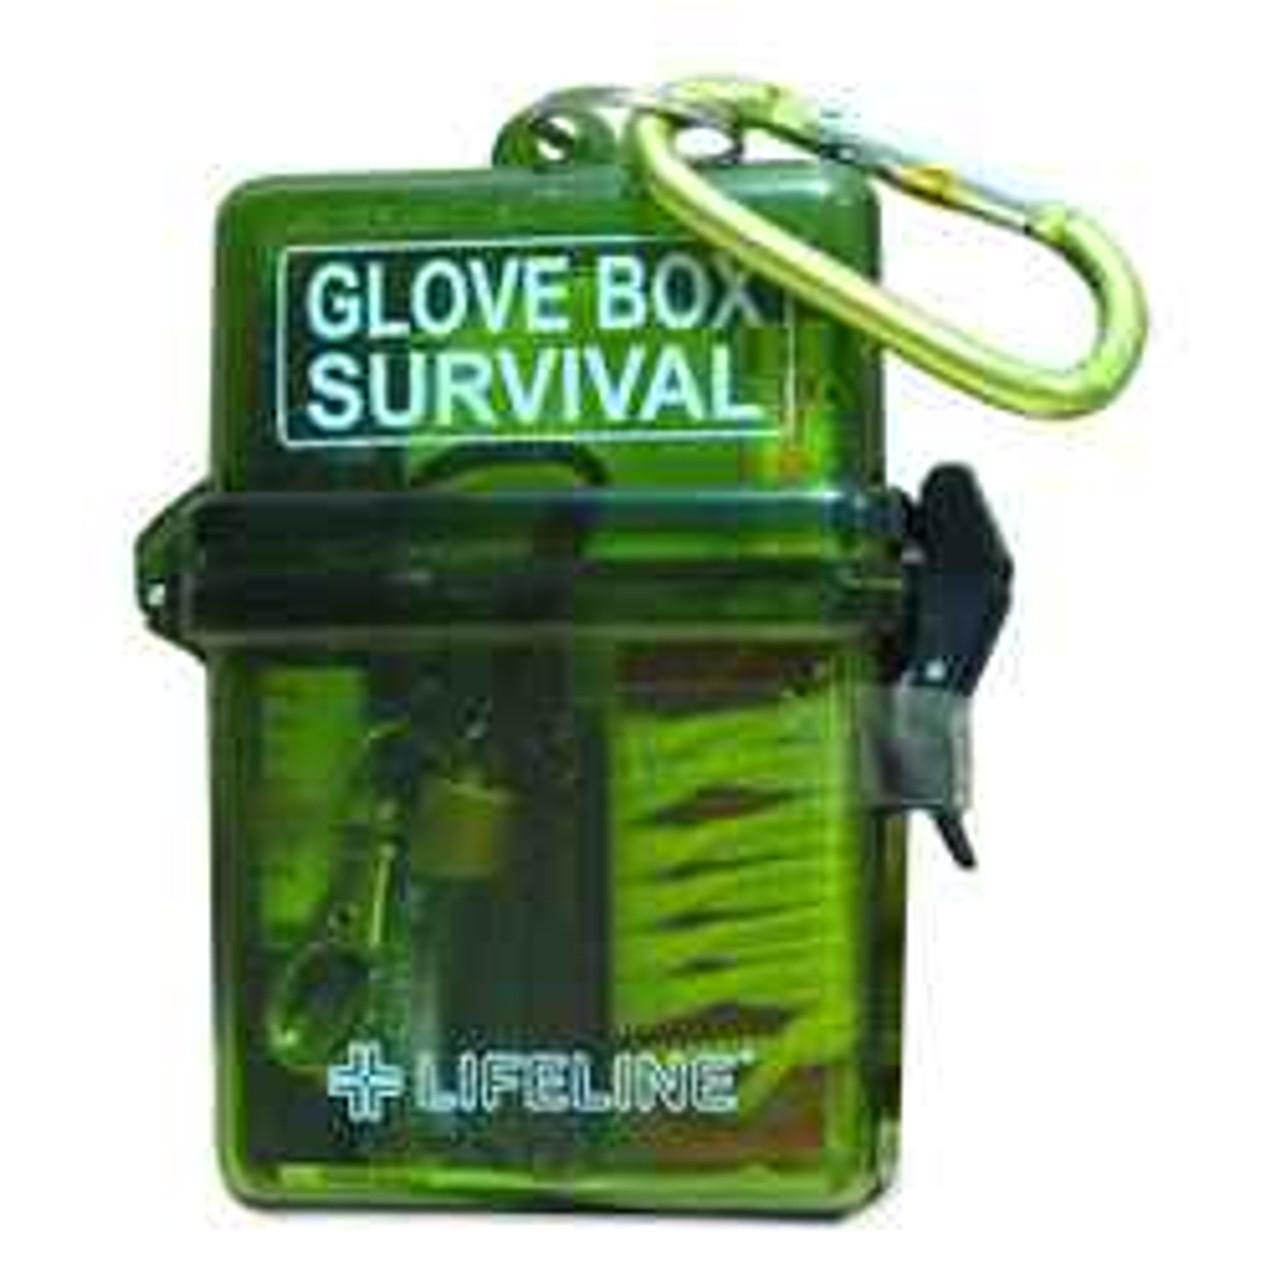 LifeLine Glove Box Survival Kit